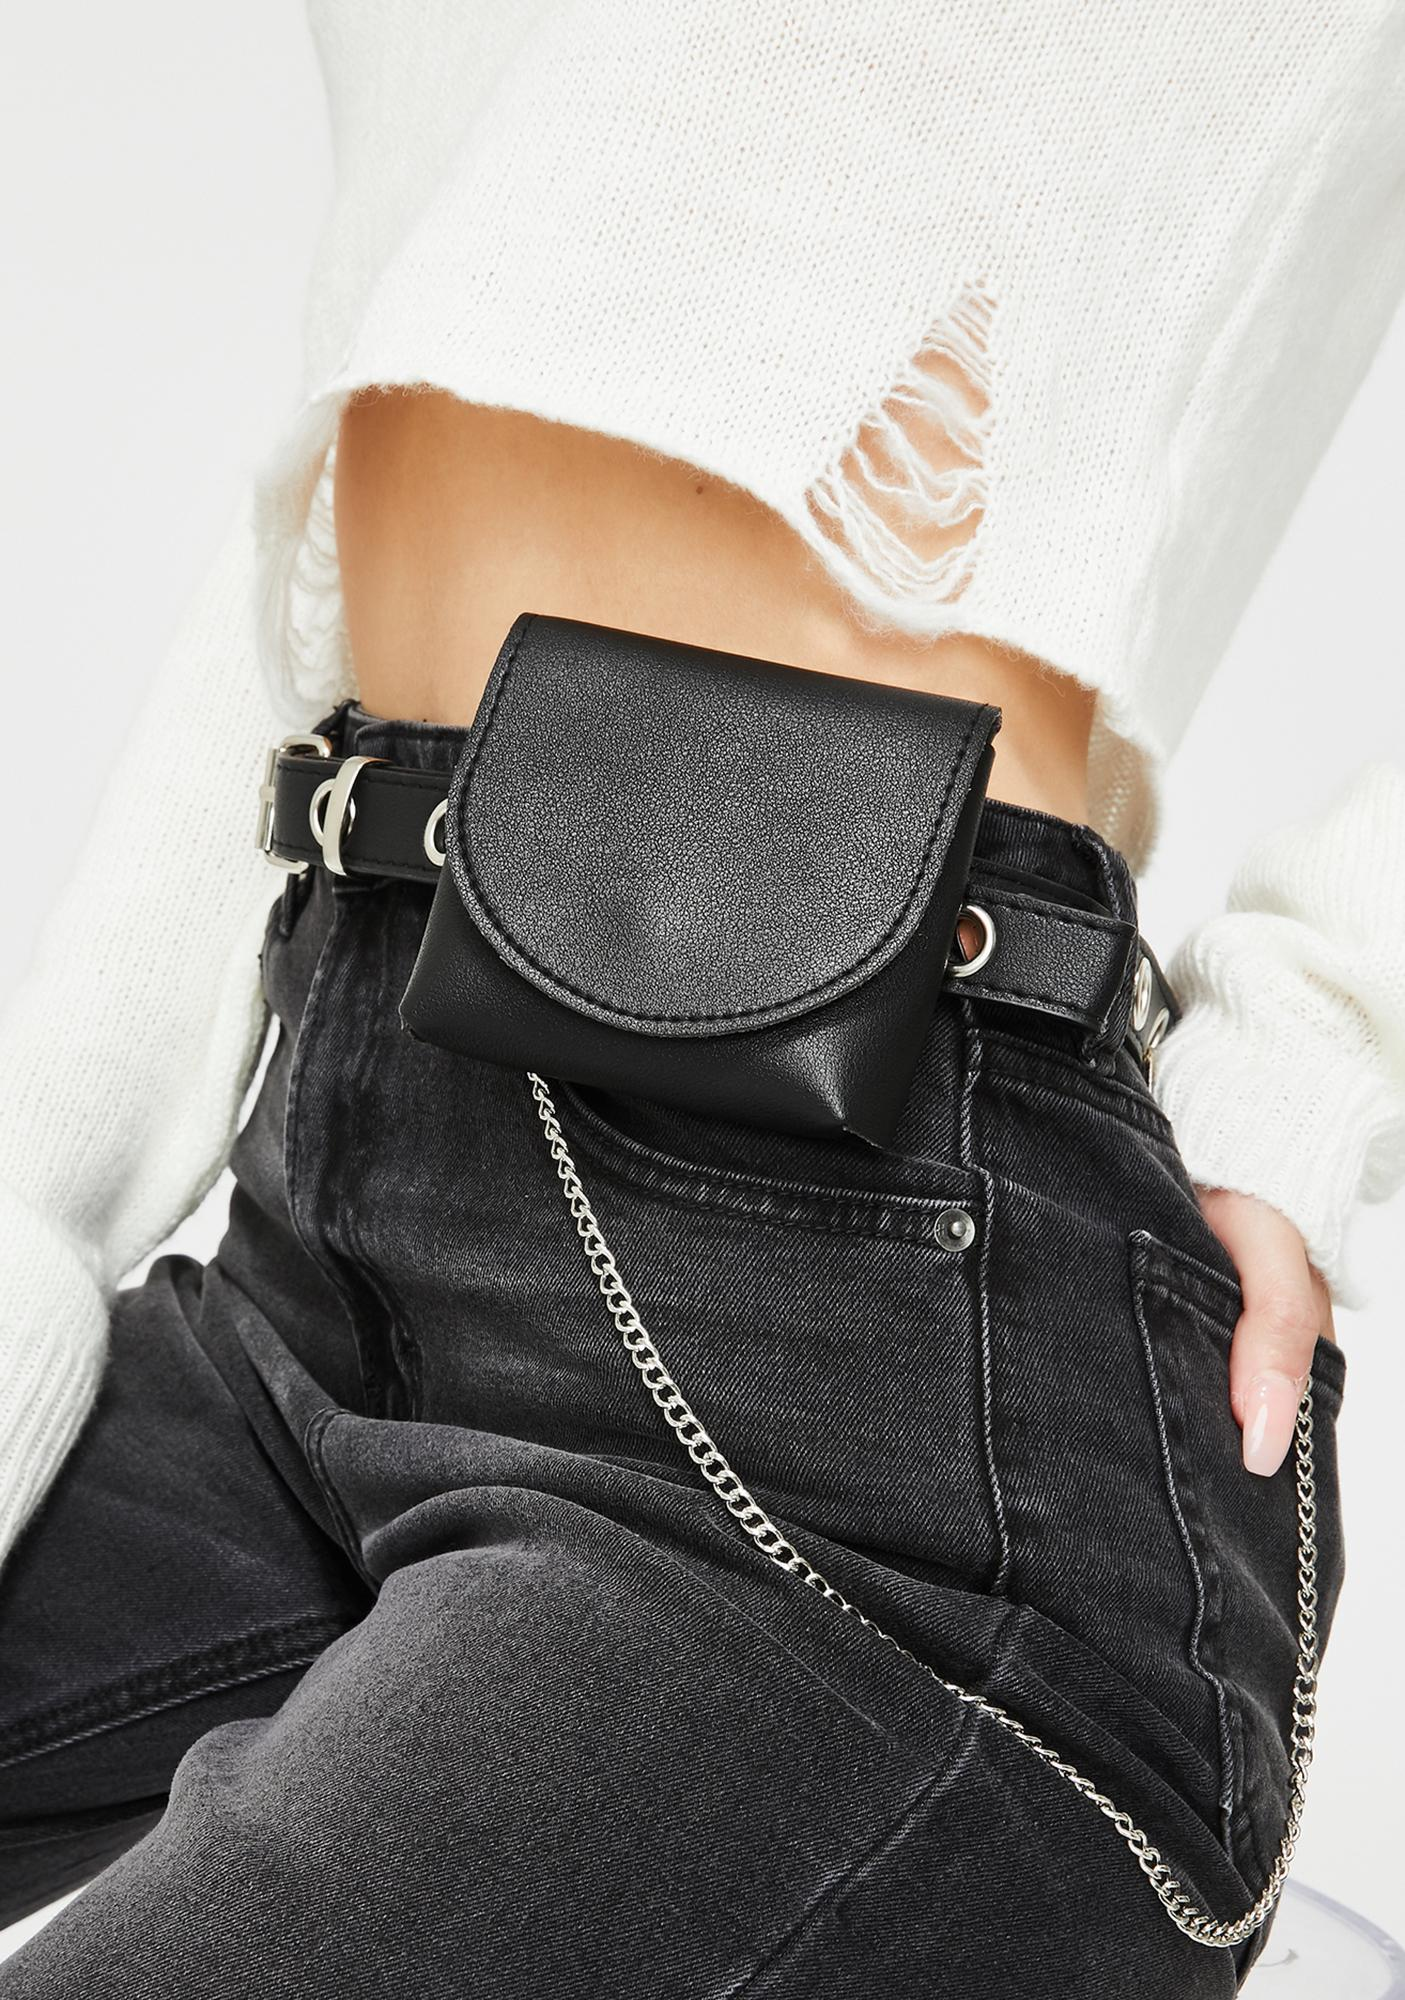 Stash My Cash Belt Bag